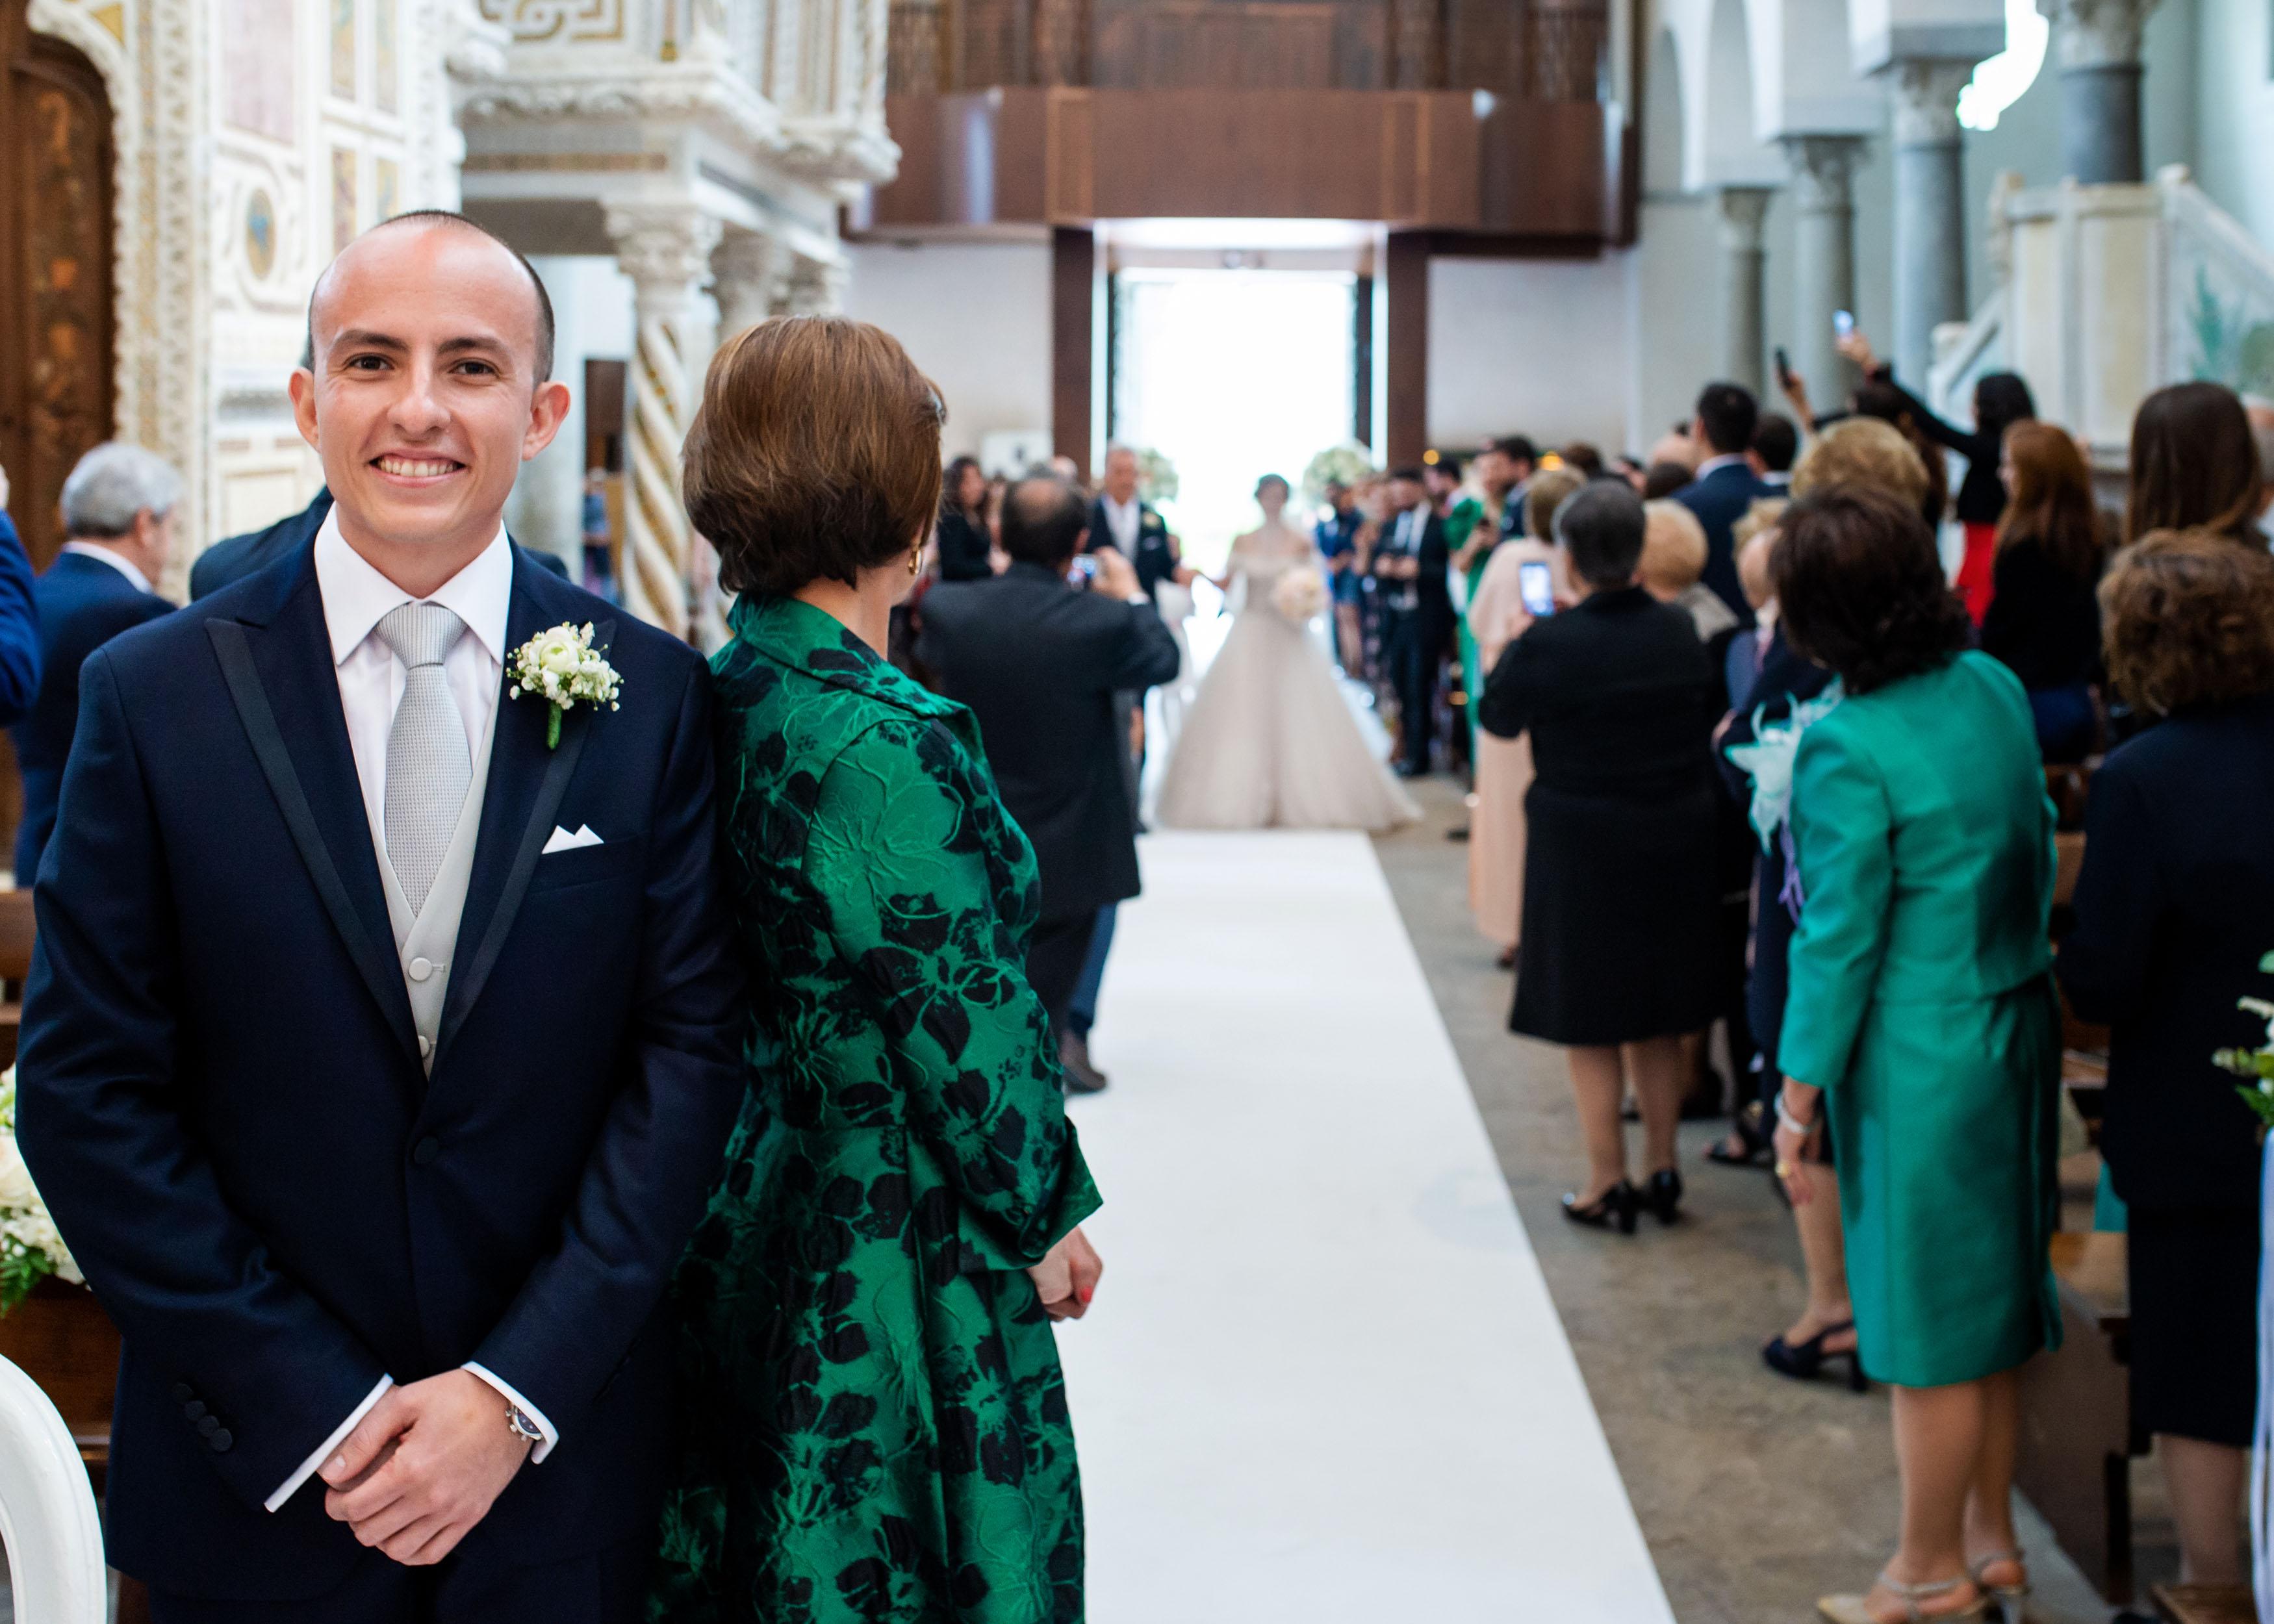 https://www.weddingamalfi.com/wp-content/uploads/Katia-Jorge-18-maggio-2019-24.jpg